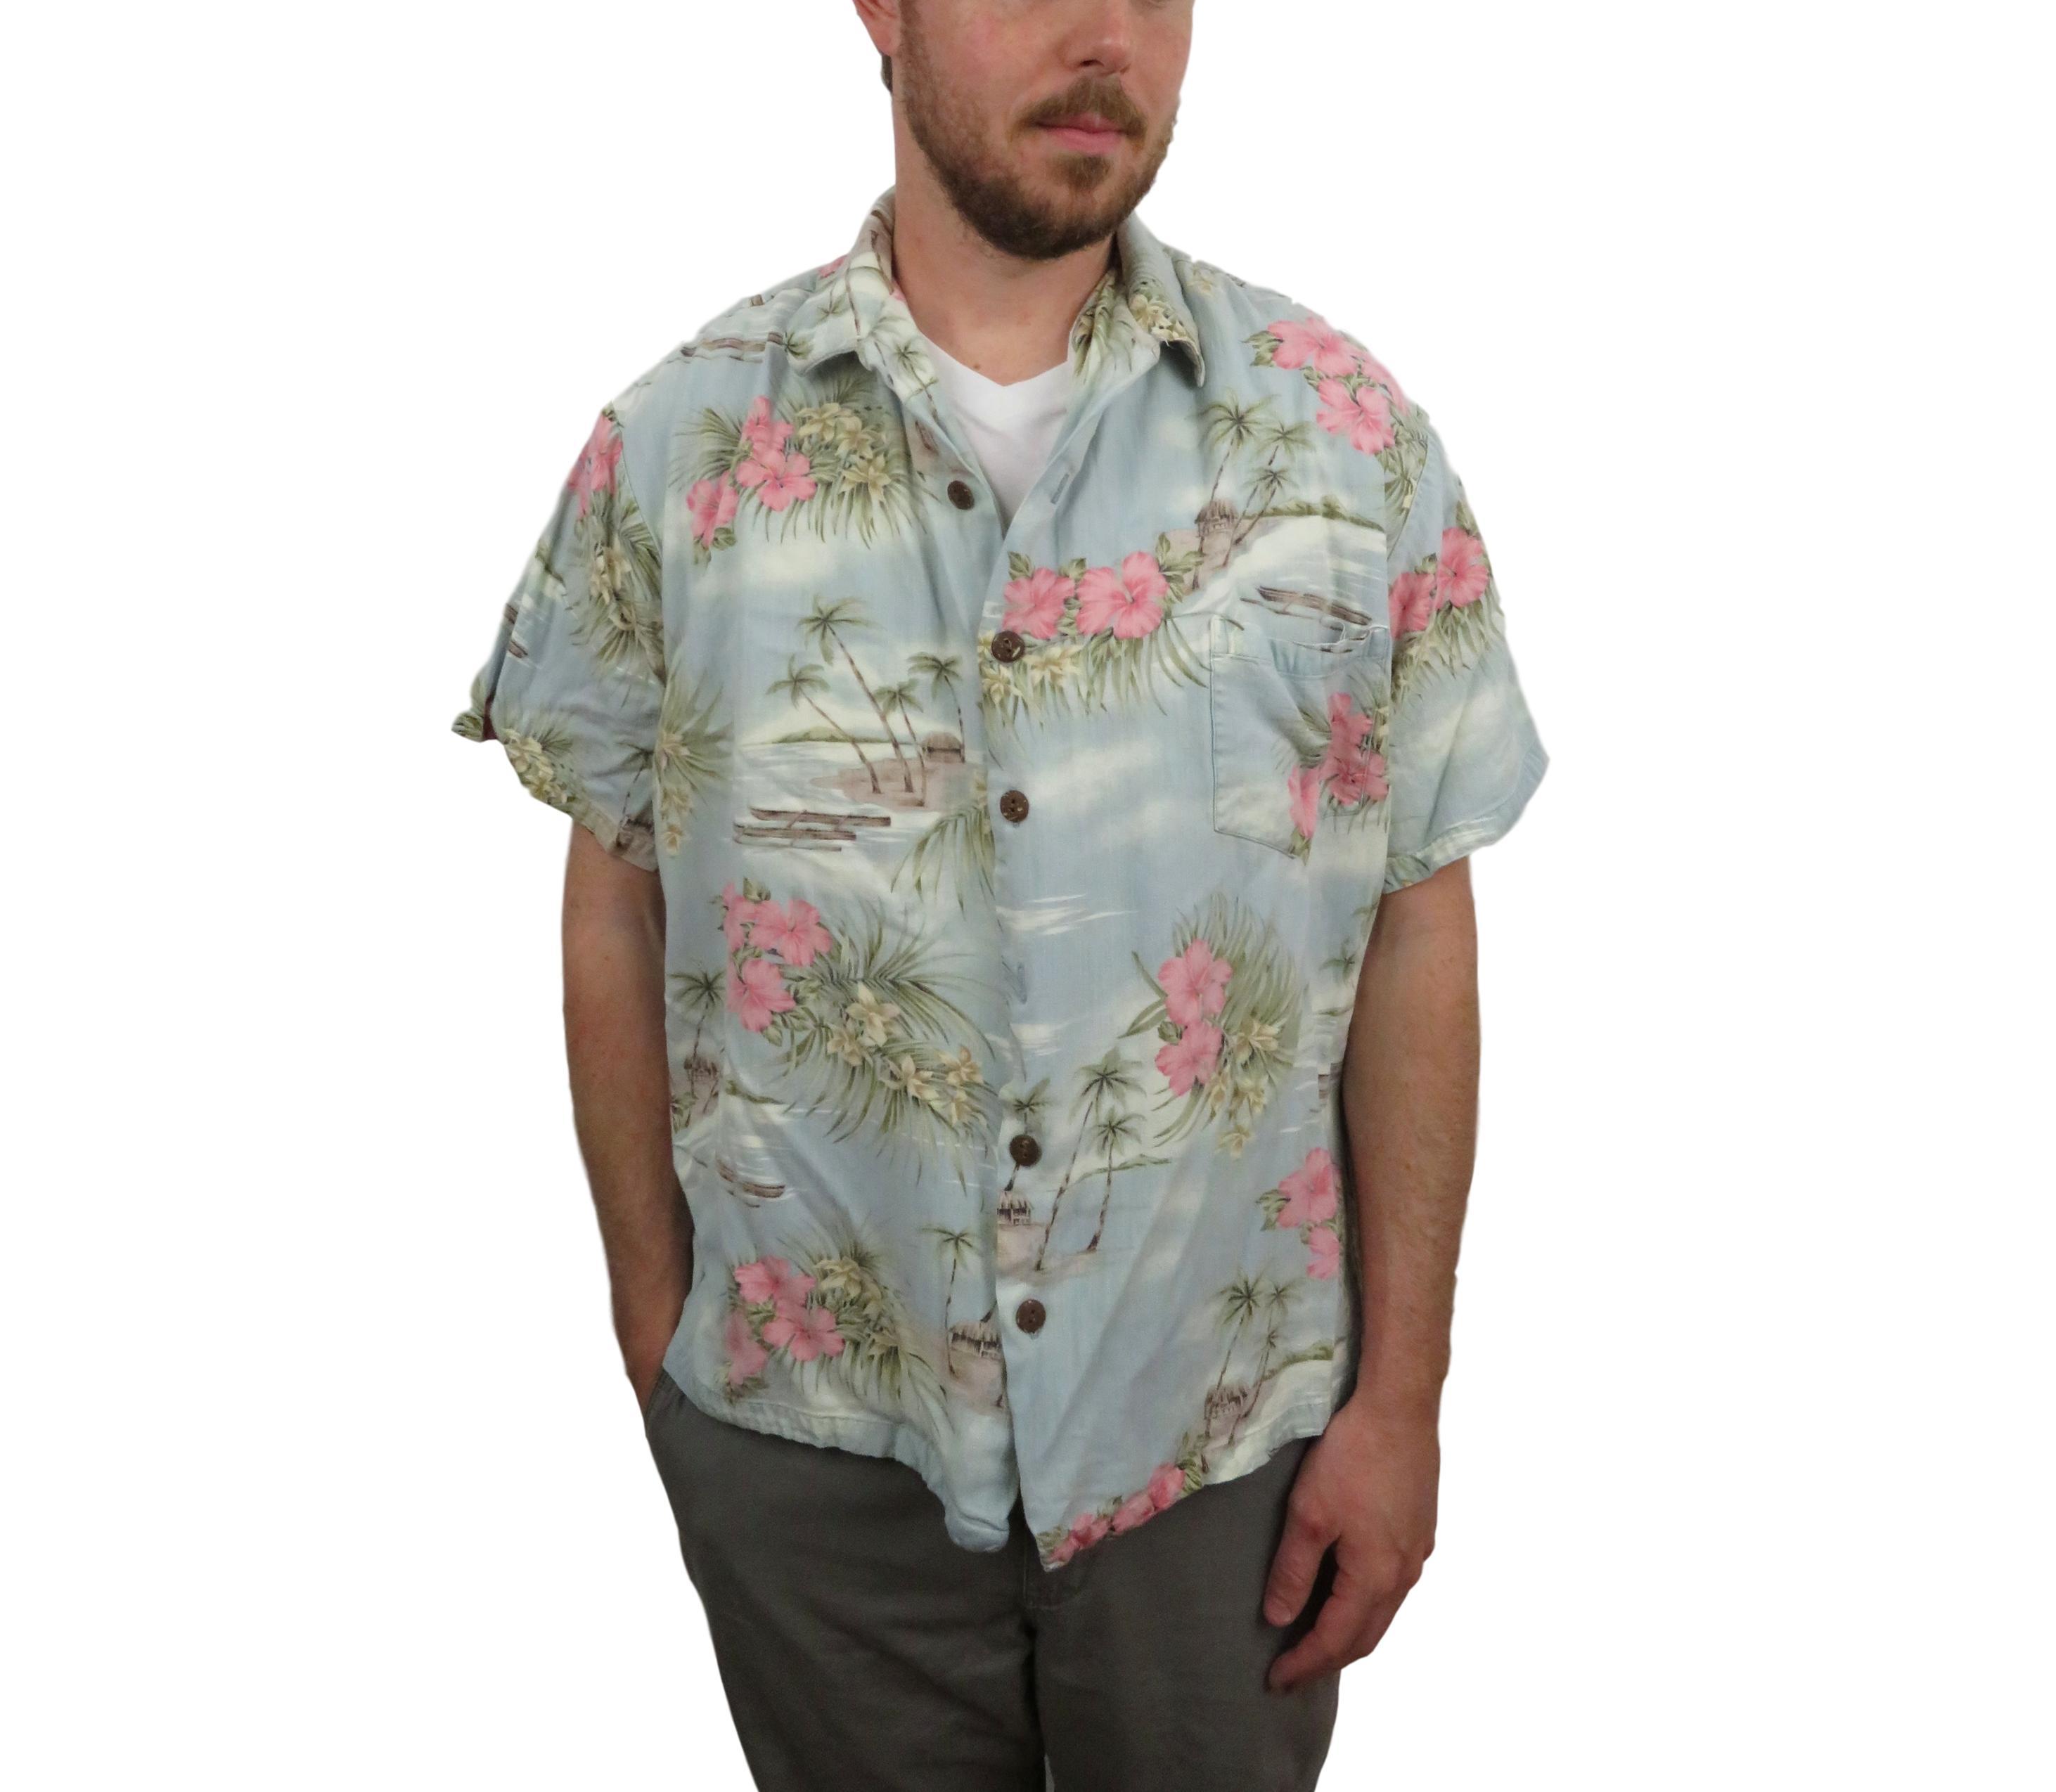 639bcc93 Vintage Vintage 70s Hilo Hattie Mens Floral Hawaiian Rayon Aloha Shirt 2xl  Camp Native L Xl Hibiscus Flowers Hut Canoe Palm Trees Button Down Short  Sleeve   ...